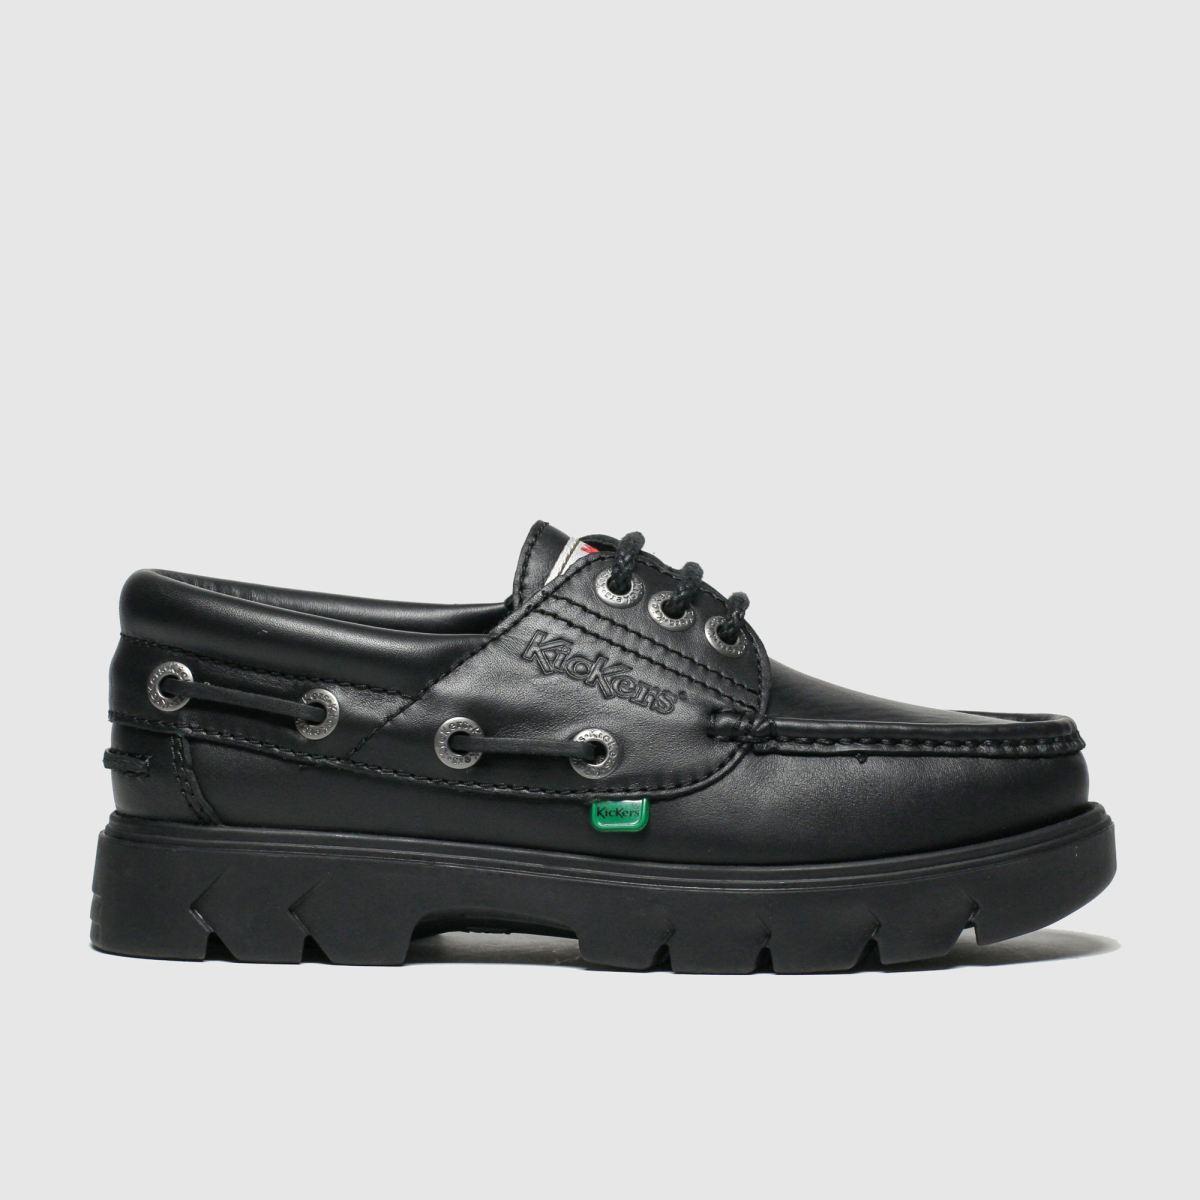 Kickers Black Lennon Boat Shoes Youth